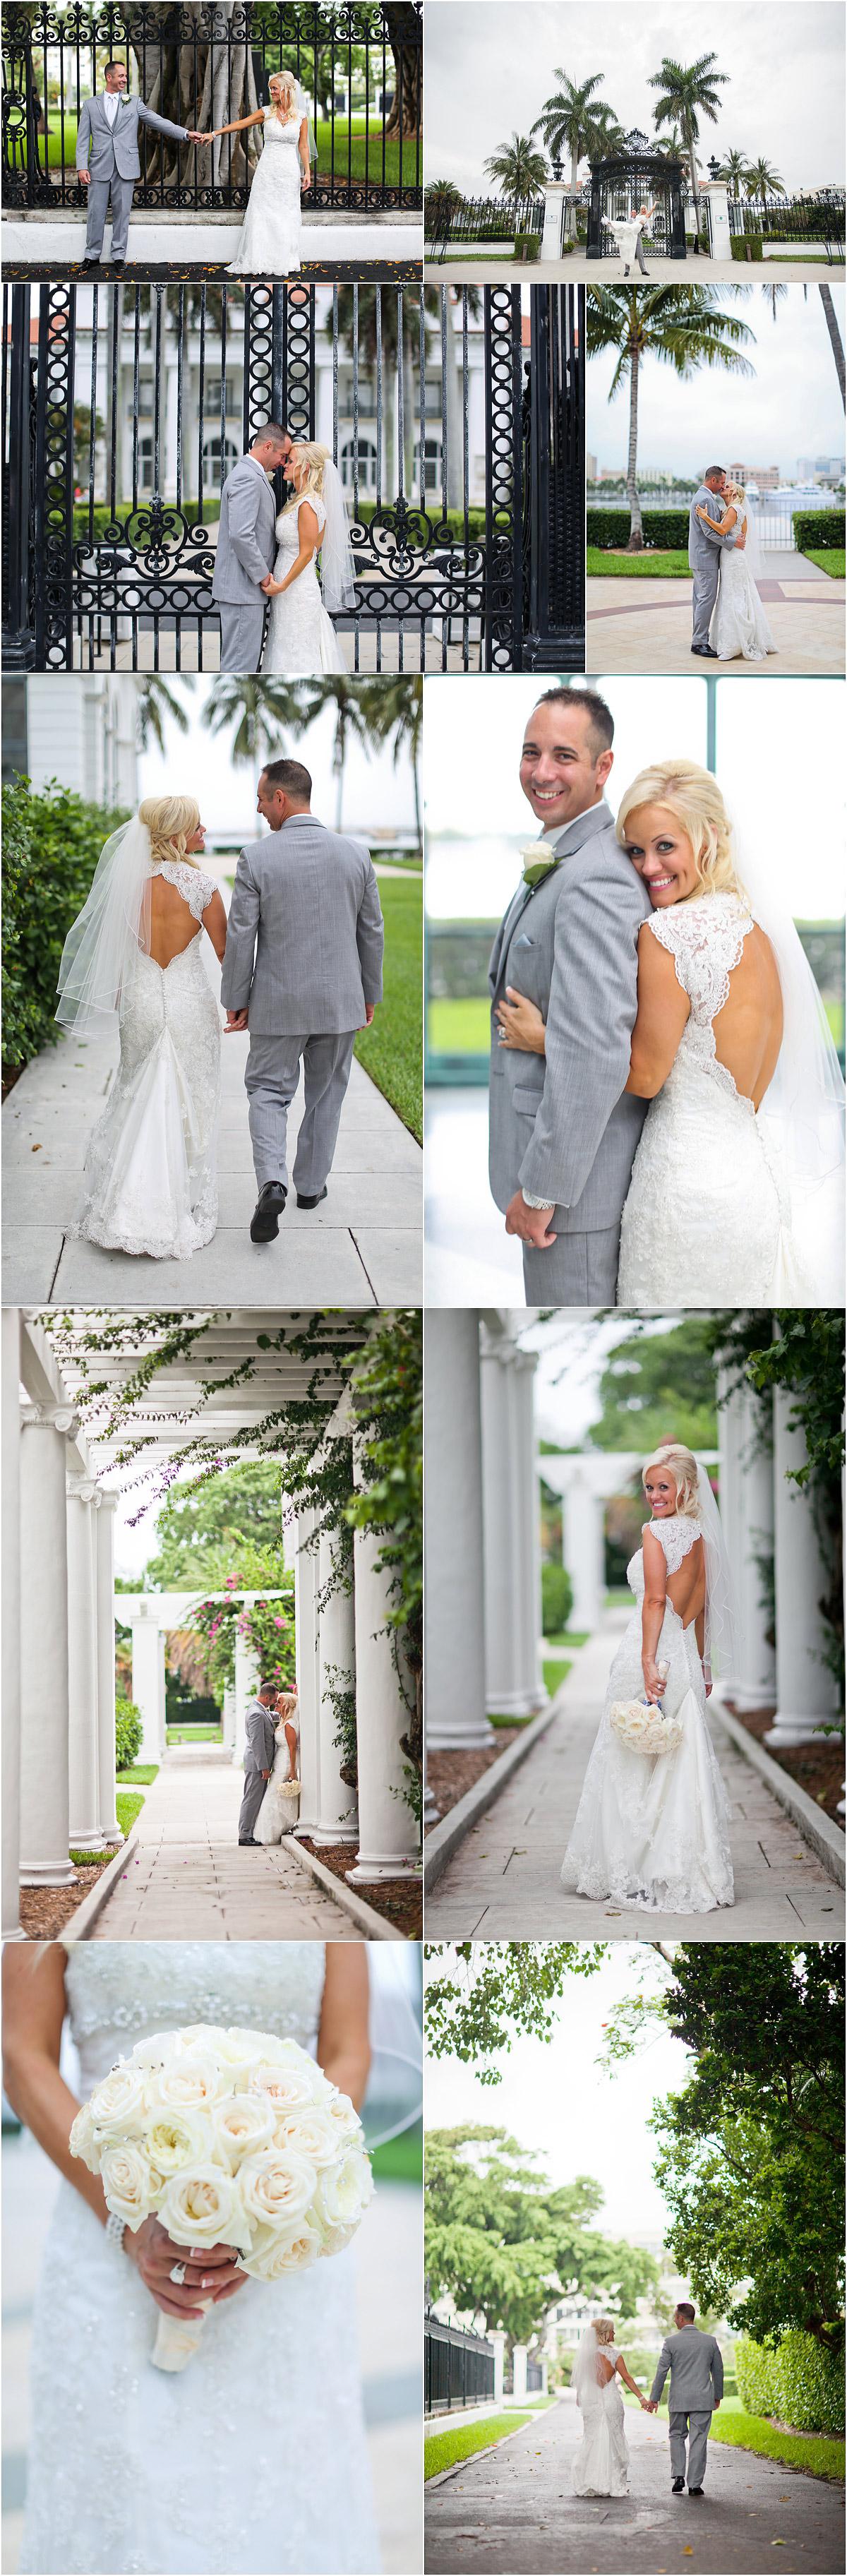 Flagler_Museum_wedding_Palm_Beach_16